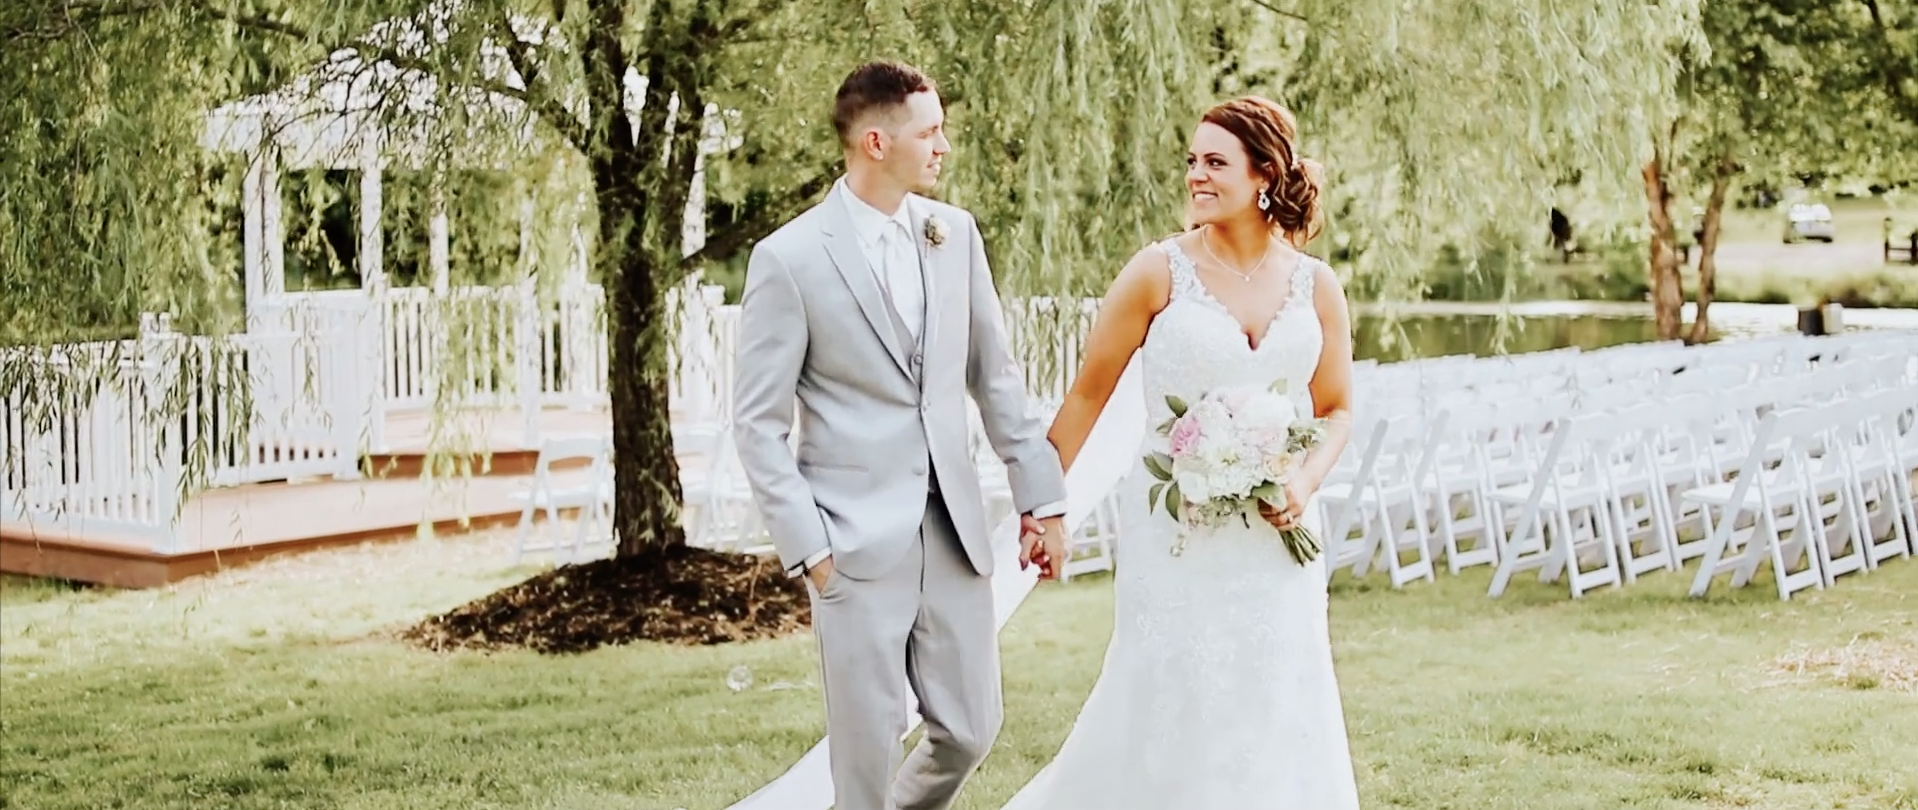 wedding videographer in Bountiful and Virginia